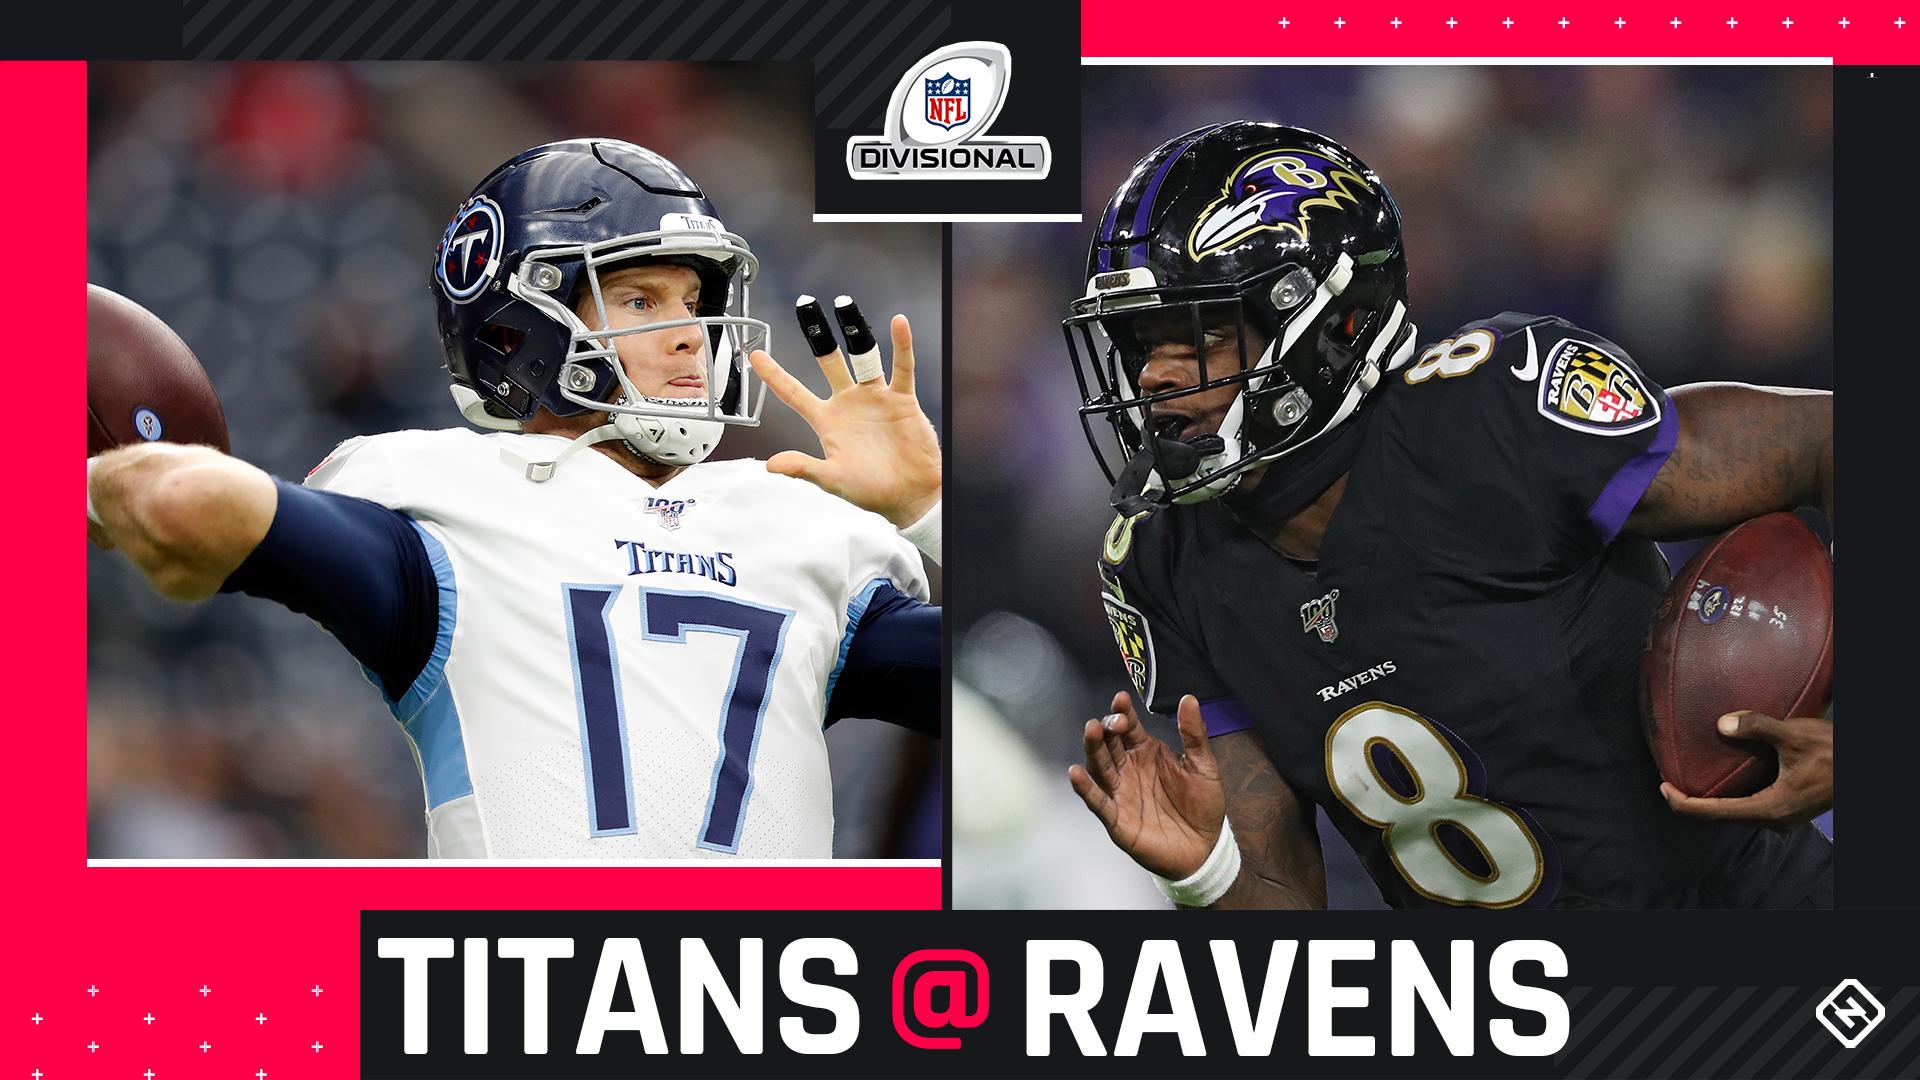 Ravens vs. Titans odds, prediction, betting trends for NFL